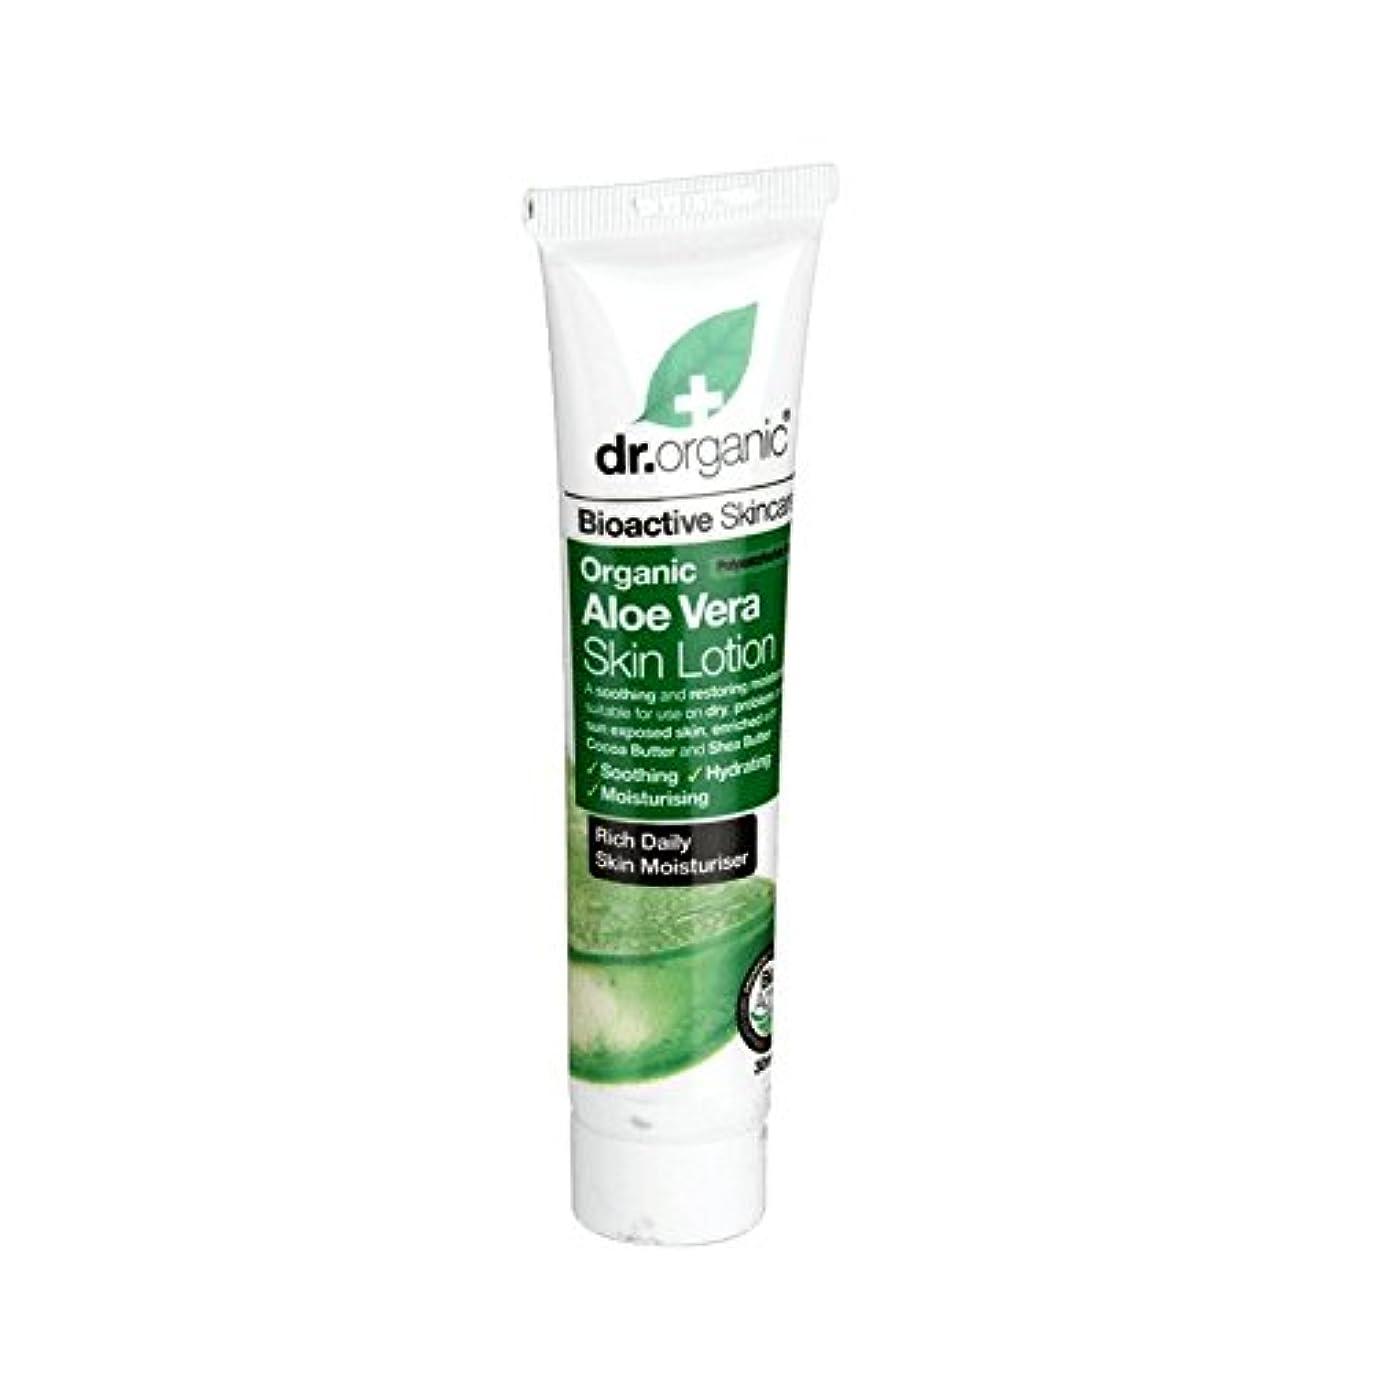 Dr Organic Aloe Vera Travel Skin Lotion 30ml (Pack of 6) - Dr有機アロエベラの旅行スキンローション30ミリリットル (x6) [並行輸入品]